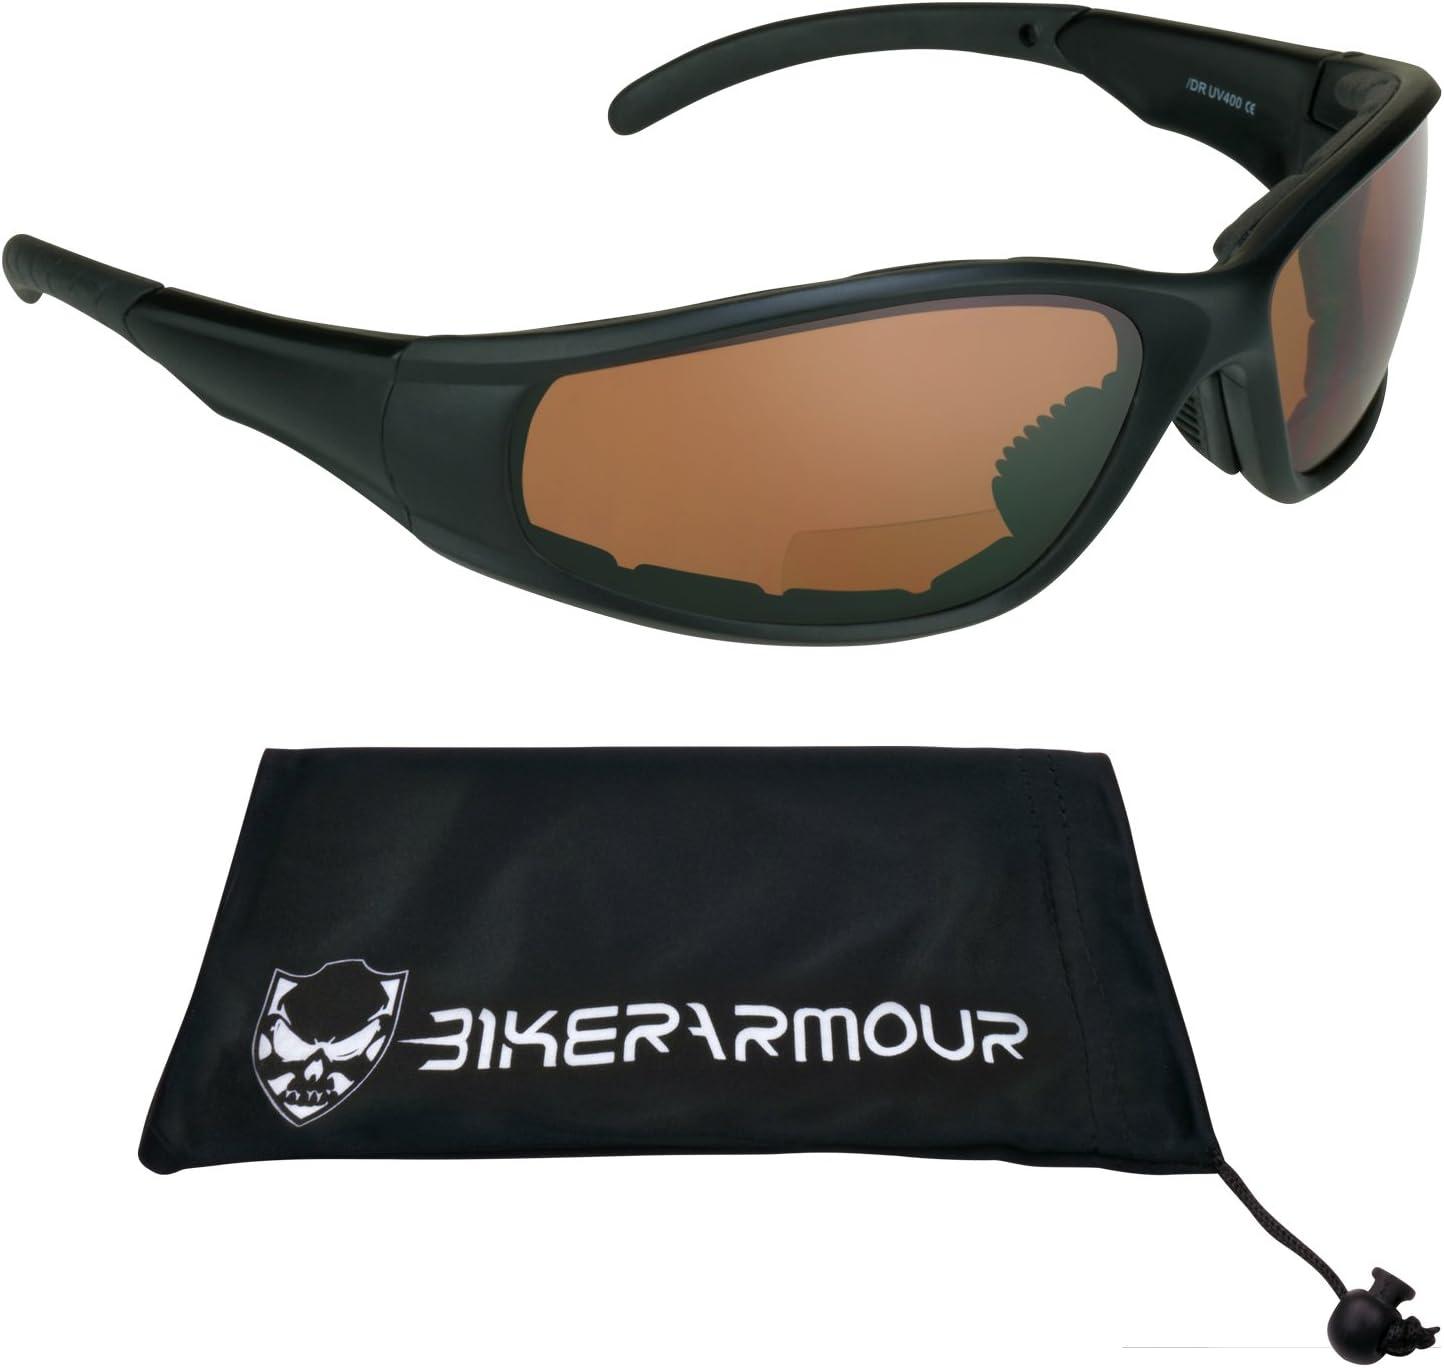 ANSI Z87.1 Safety Lens /& Microfiber Cleaning Case. Bikershades Blue Blocking HD Vision Motorcycle Bifocal Sunglasses Padded 2.00 for Men /& Women